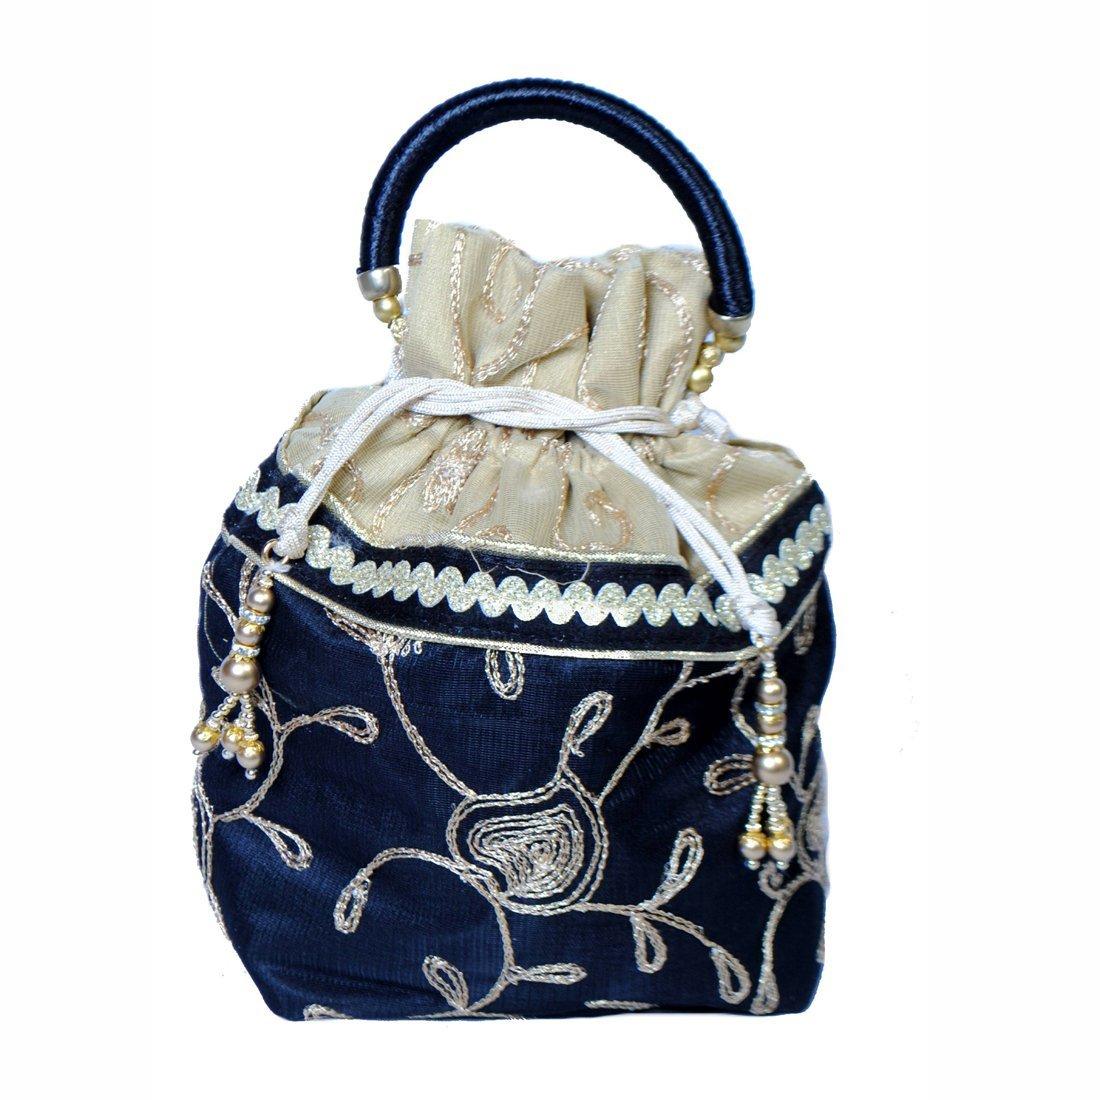 Maitri Creations Women Traditional Silk Brocade Purse Potli Bag Drawstring Jewelry Pouch Bag Cotton Gift Bag Value Set Wristlet Beaded Handbag Wedding Evening Party Designer Bridal Clutch Purple